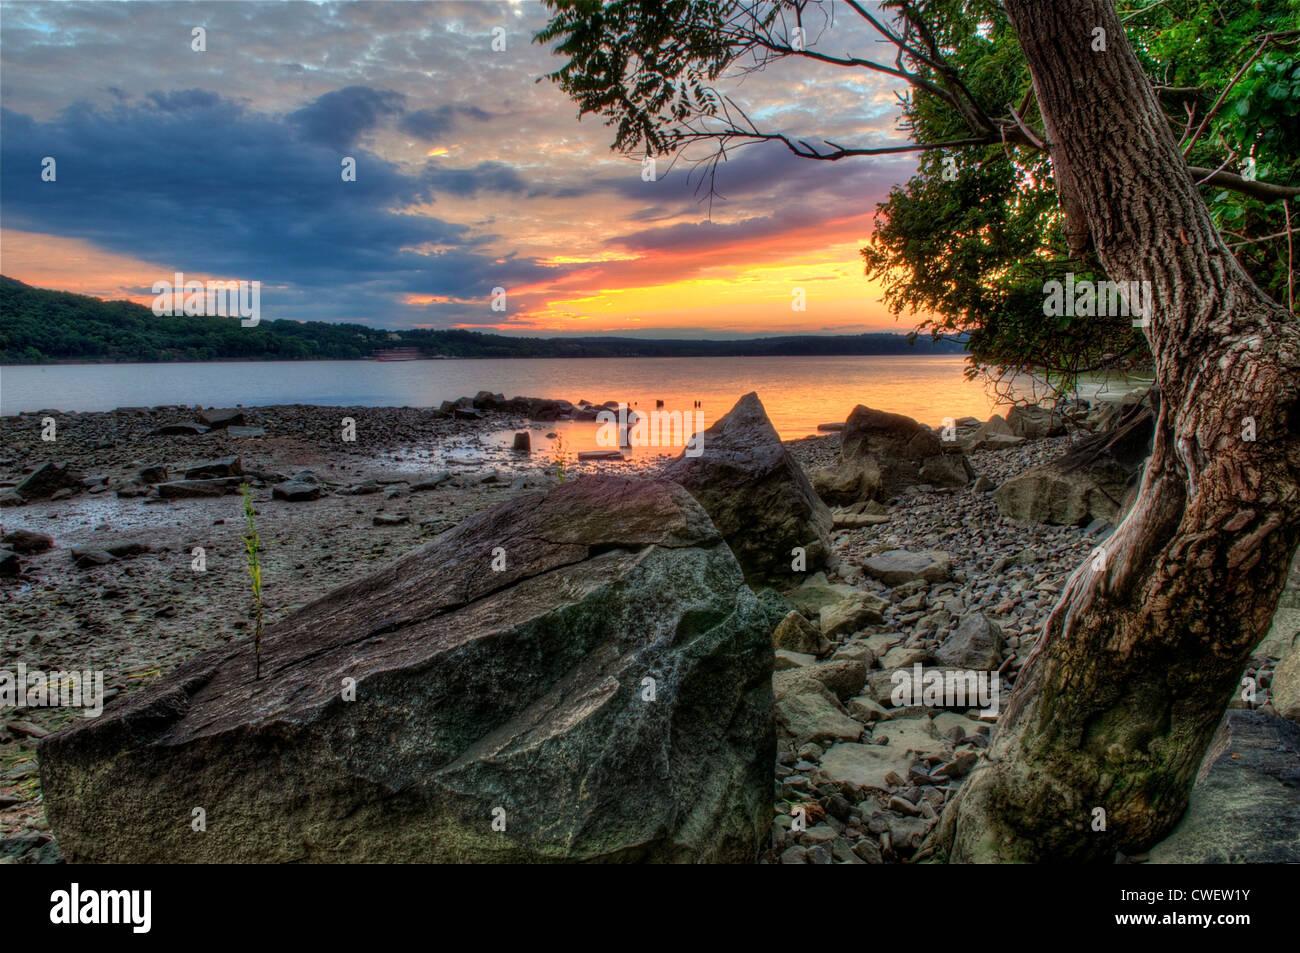 sunset on the hudson river, hudson valley - Stock Image